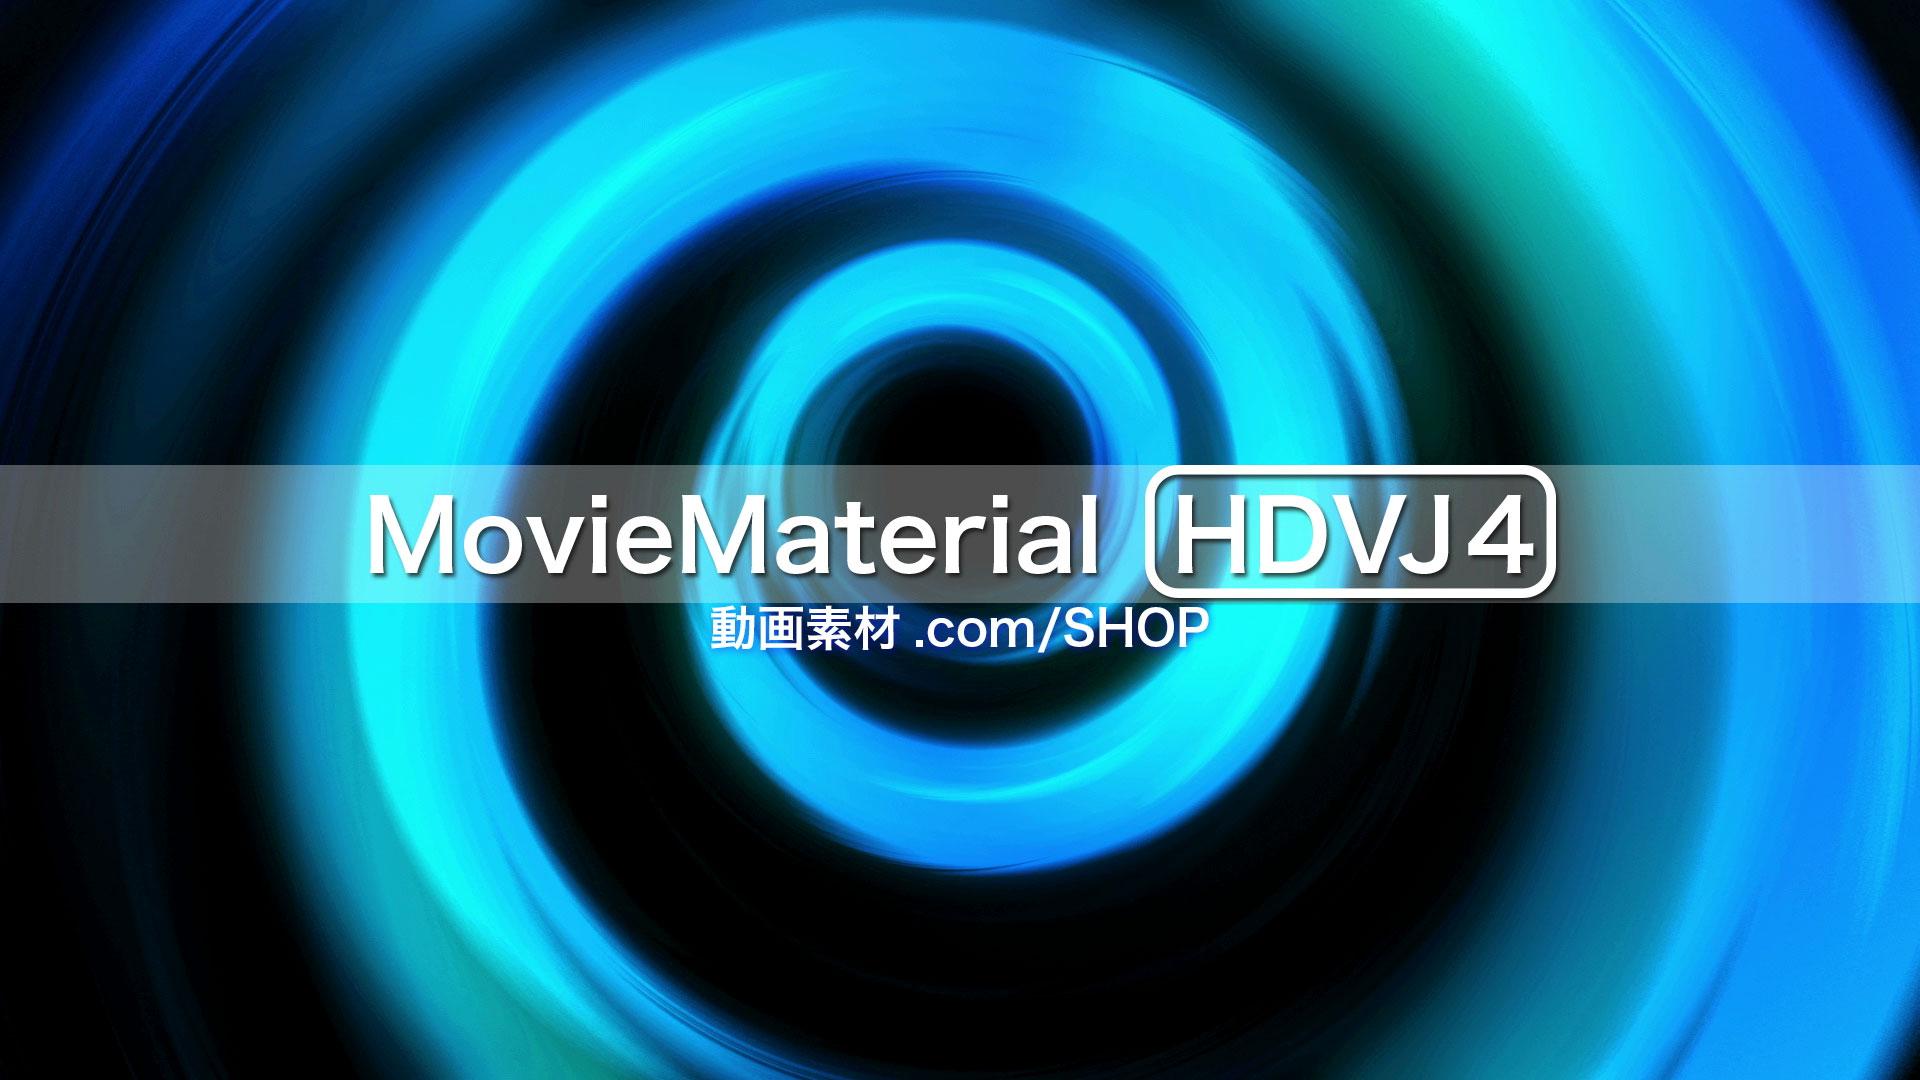 MovieMaterial HDVJ4 フルハイビジョンVJ動画素材集 画像4